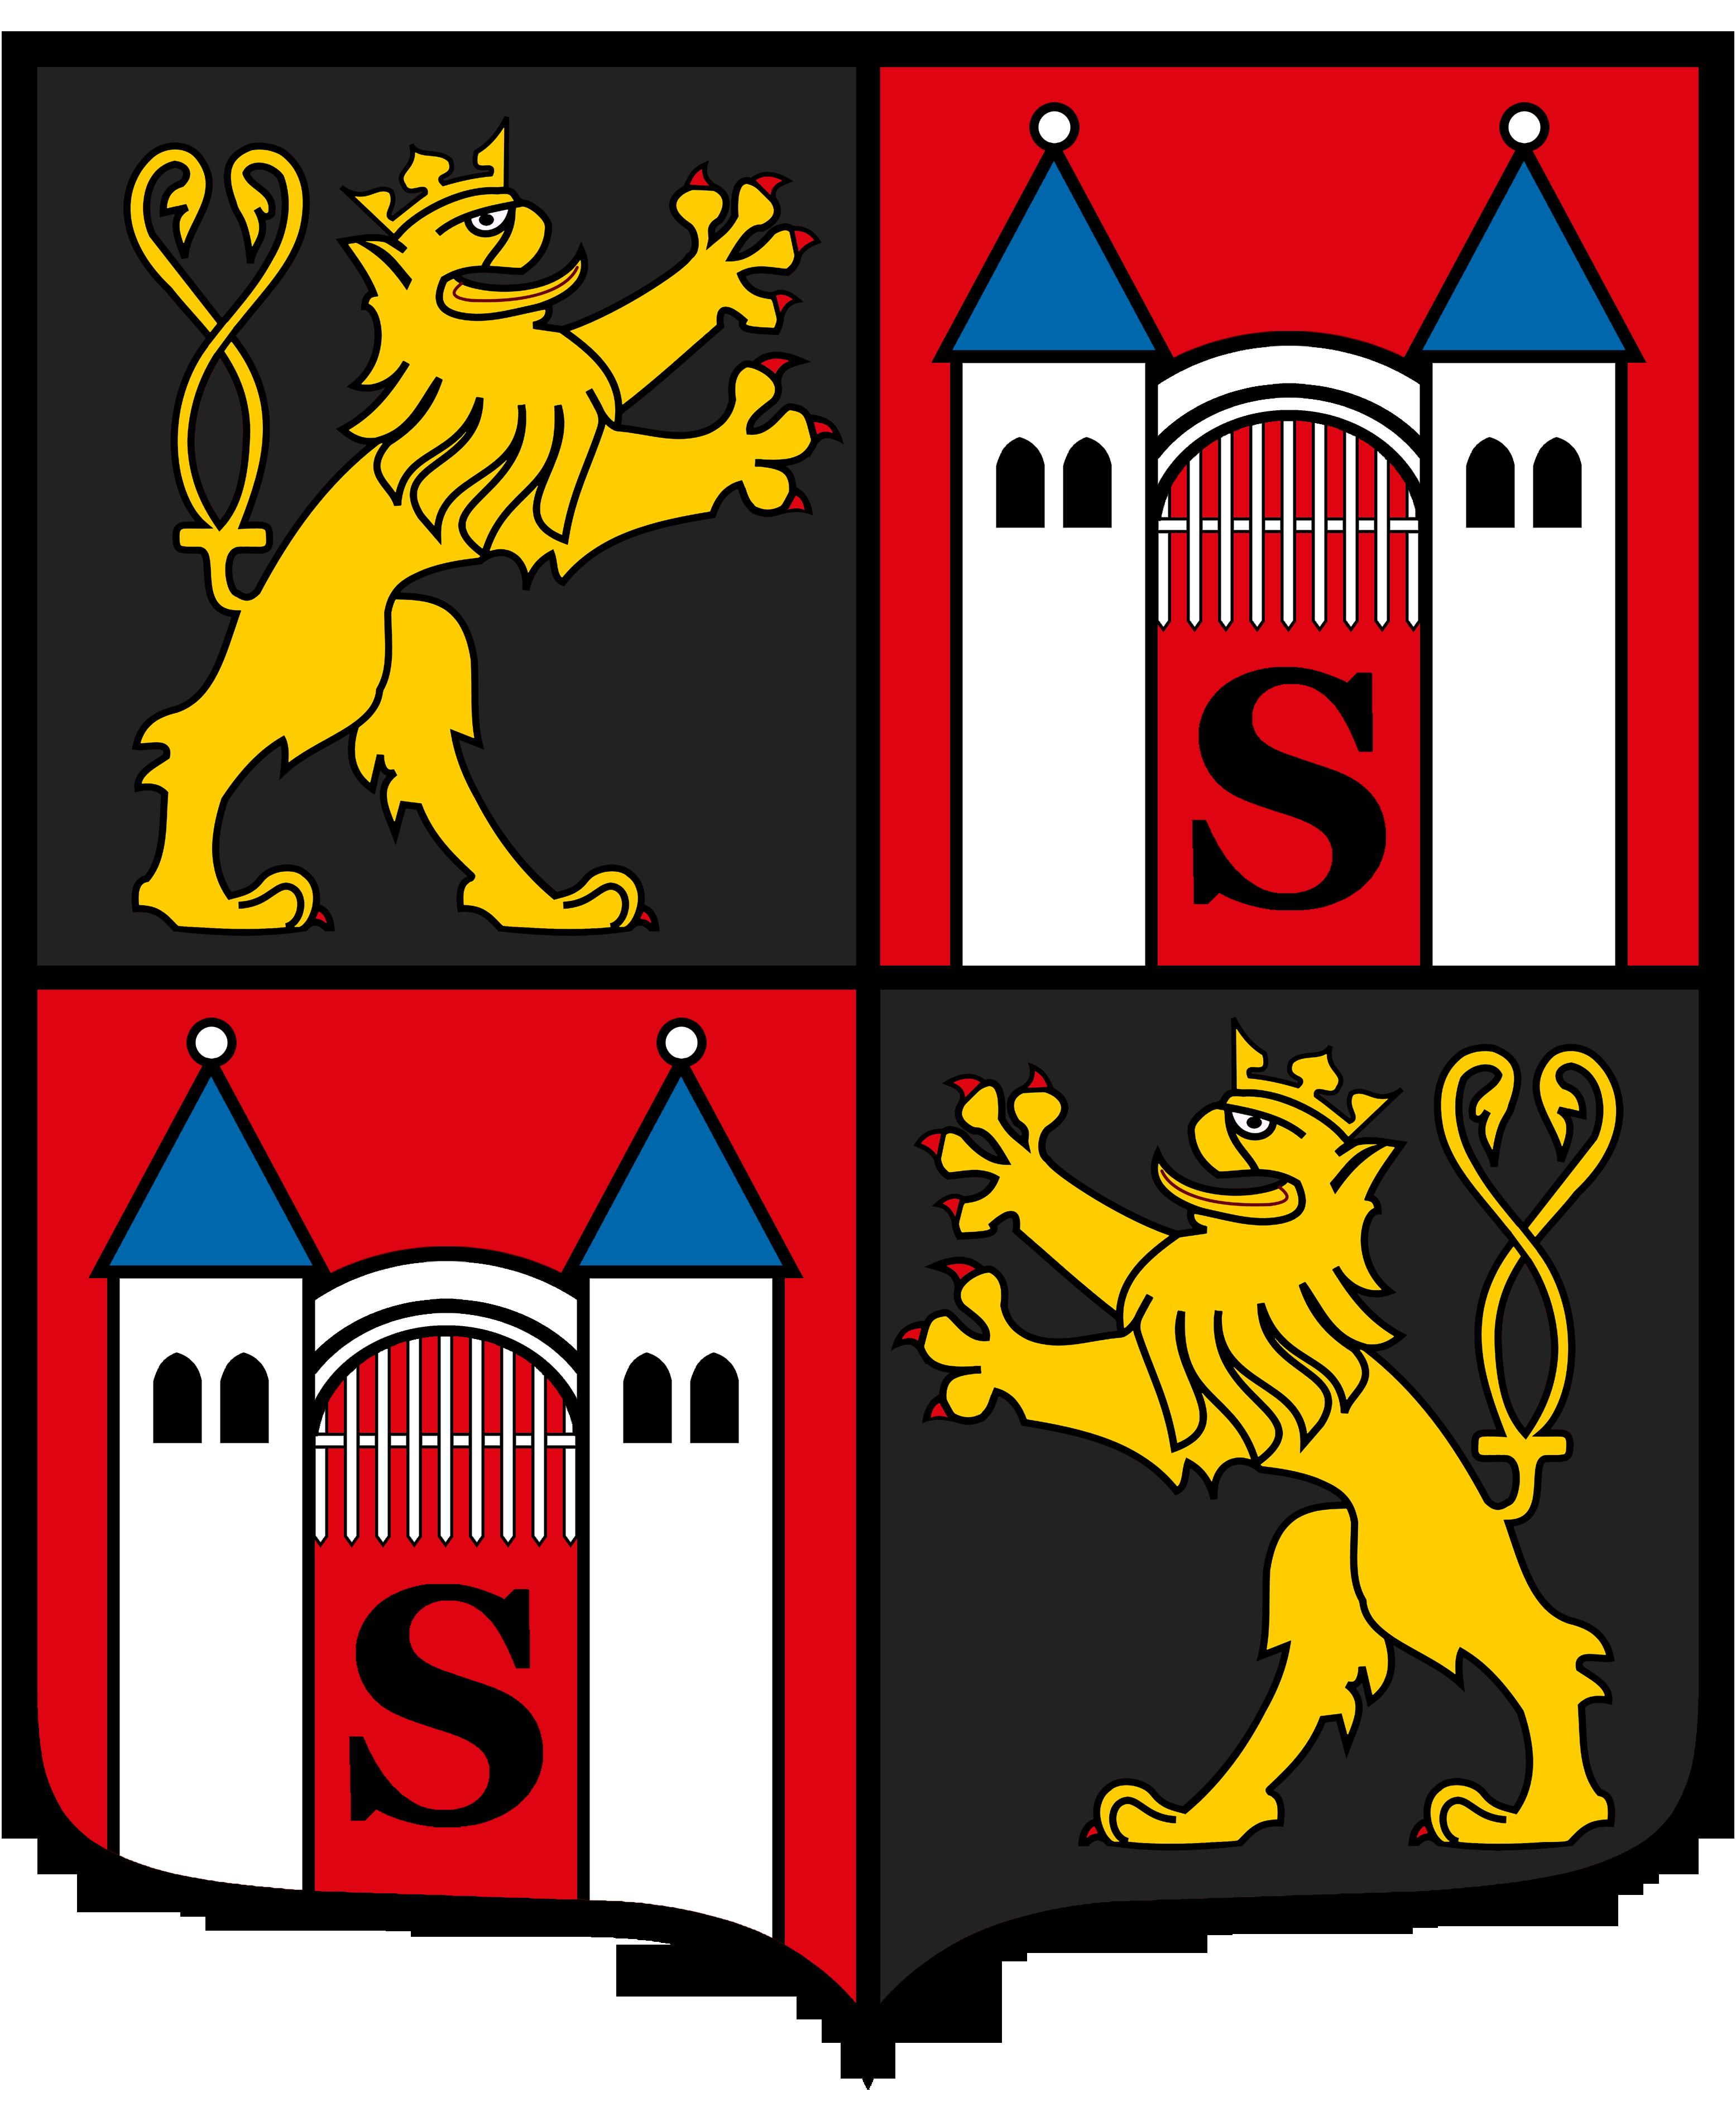 File:POL Żagań COA 1602.